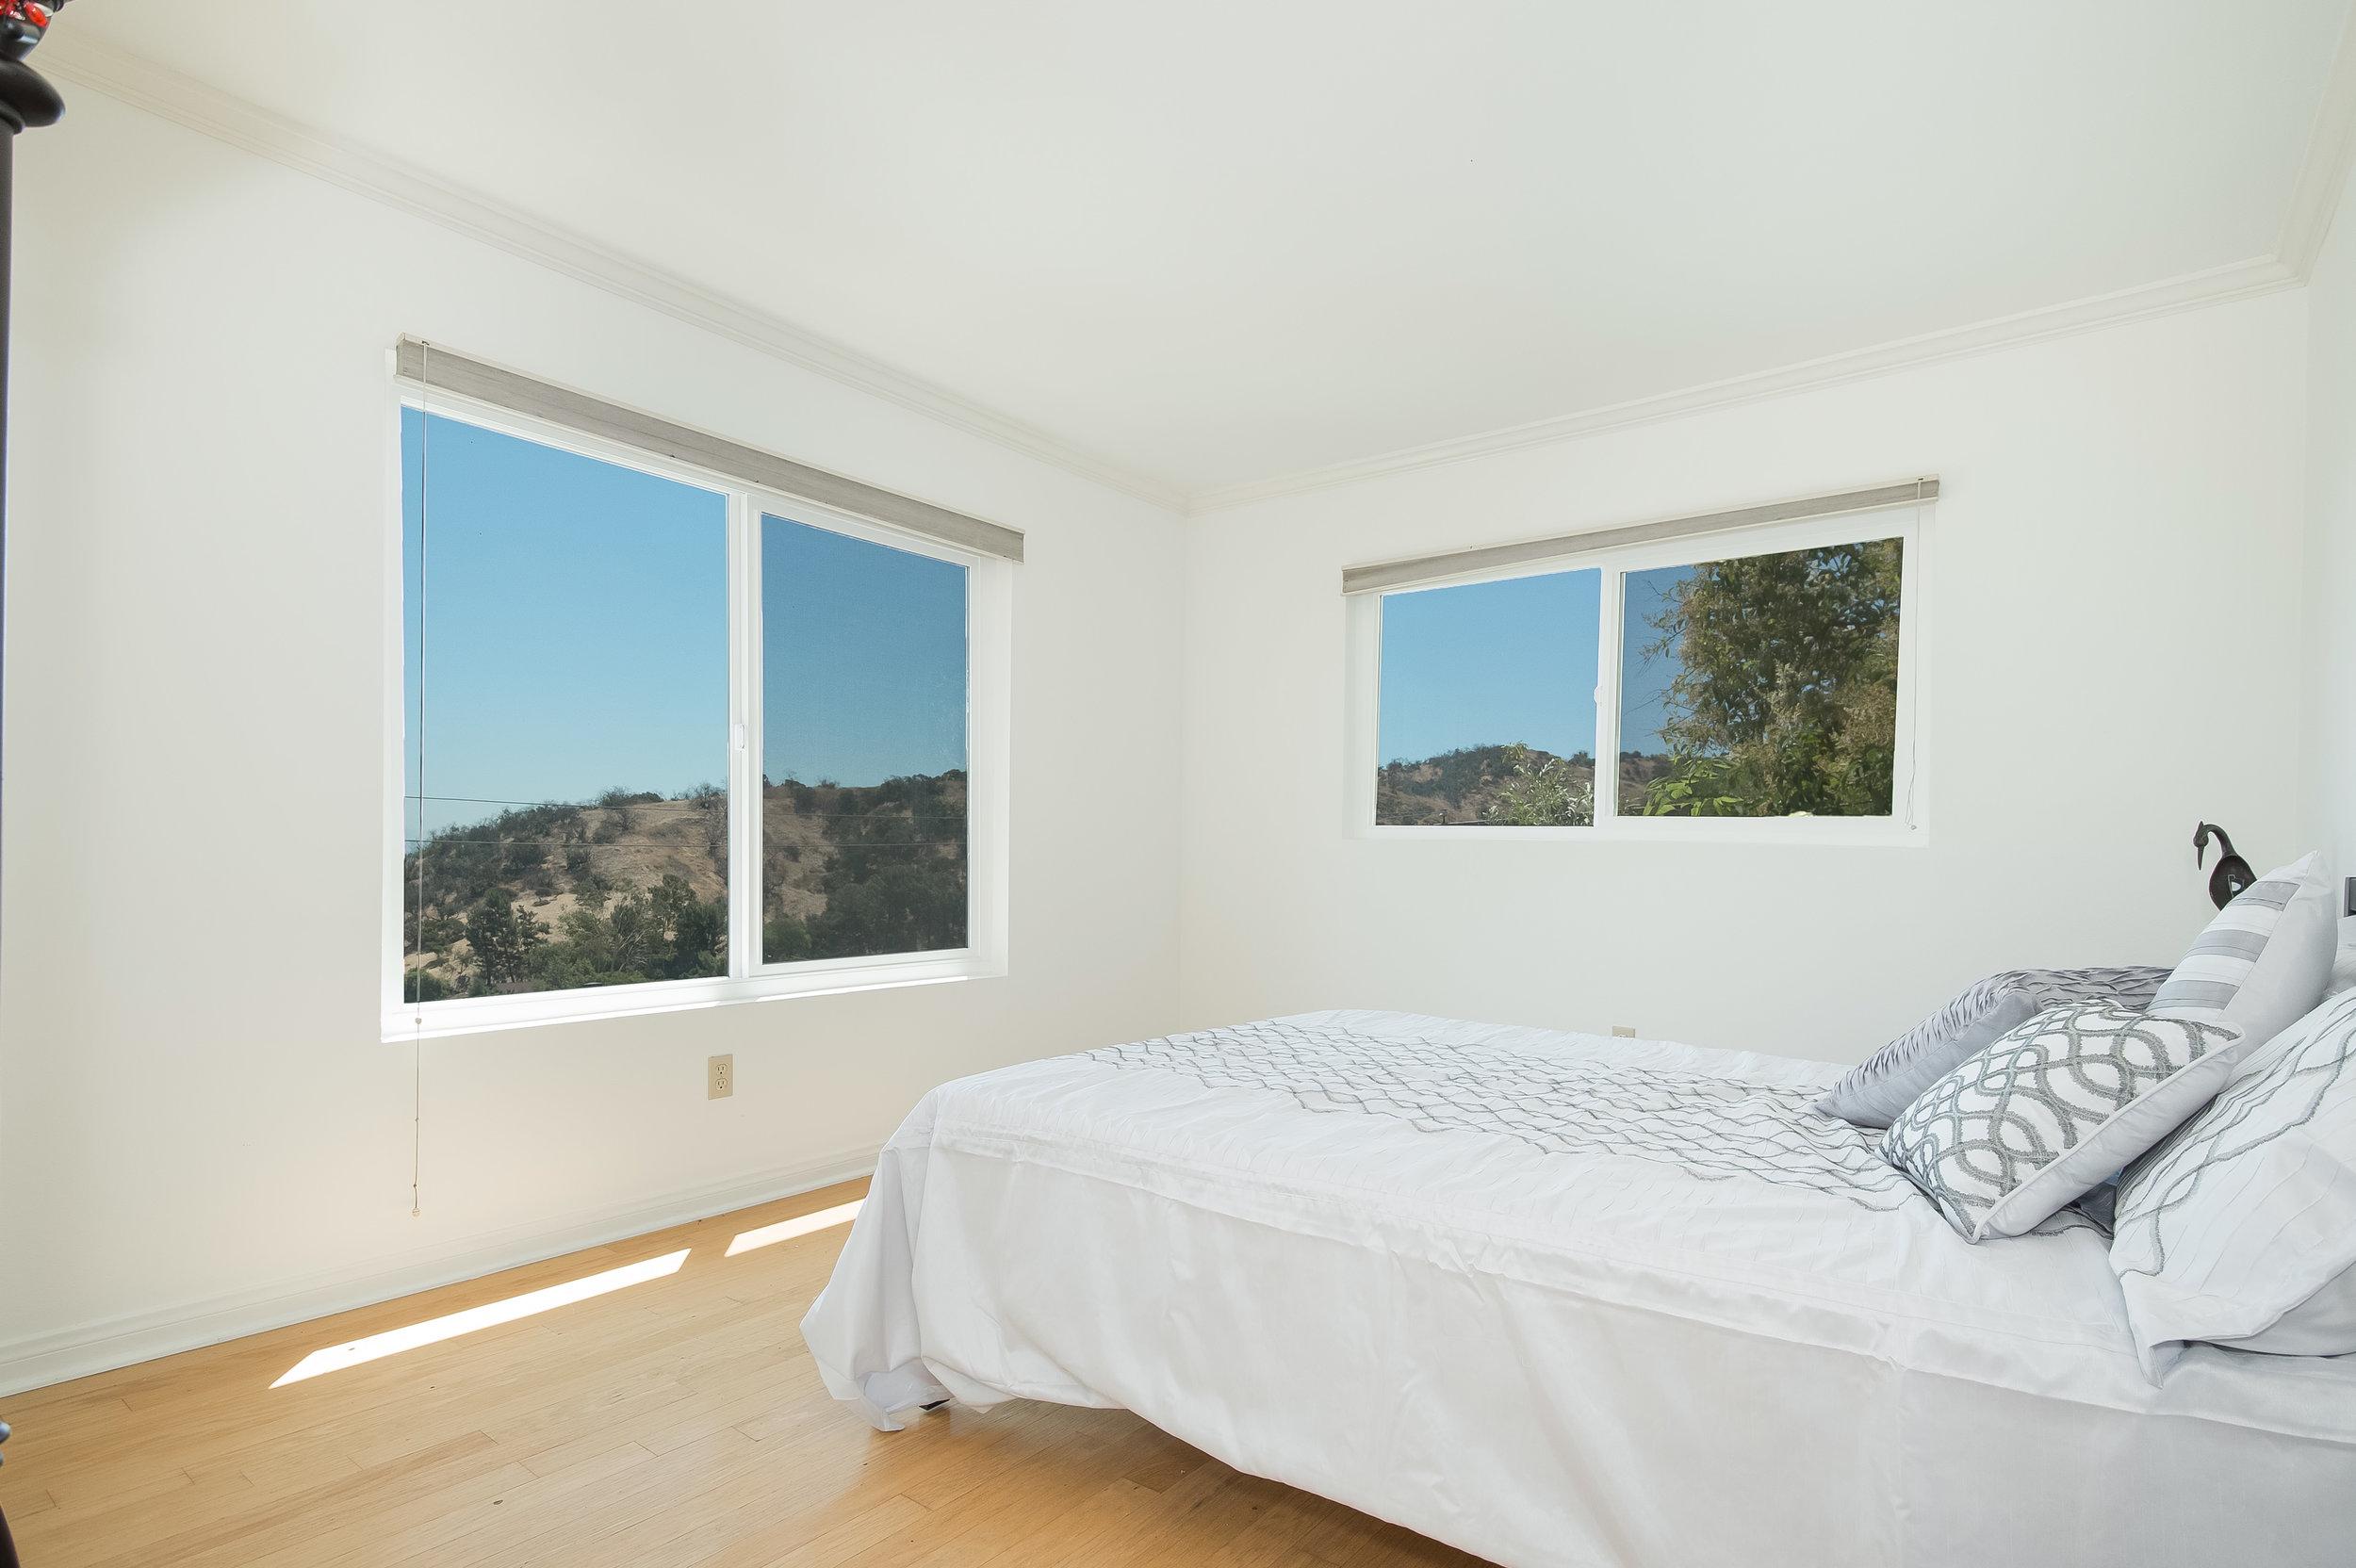 007 Bedroom 15072 Rayneta Sherman Oaks For Sale The Malibu Life Team Luxury Real Estate.jpg